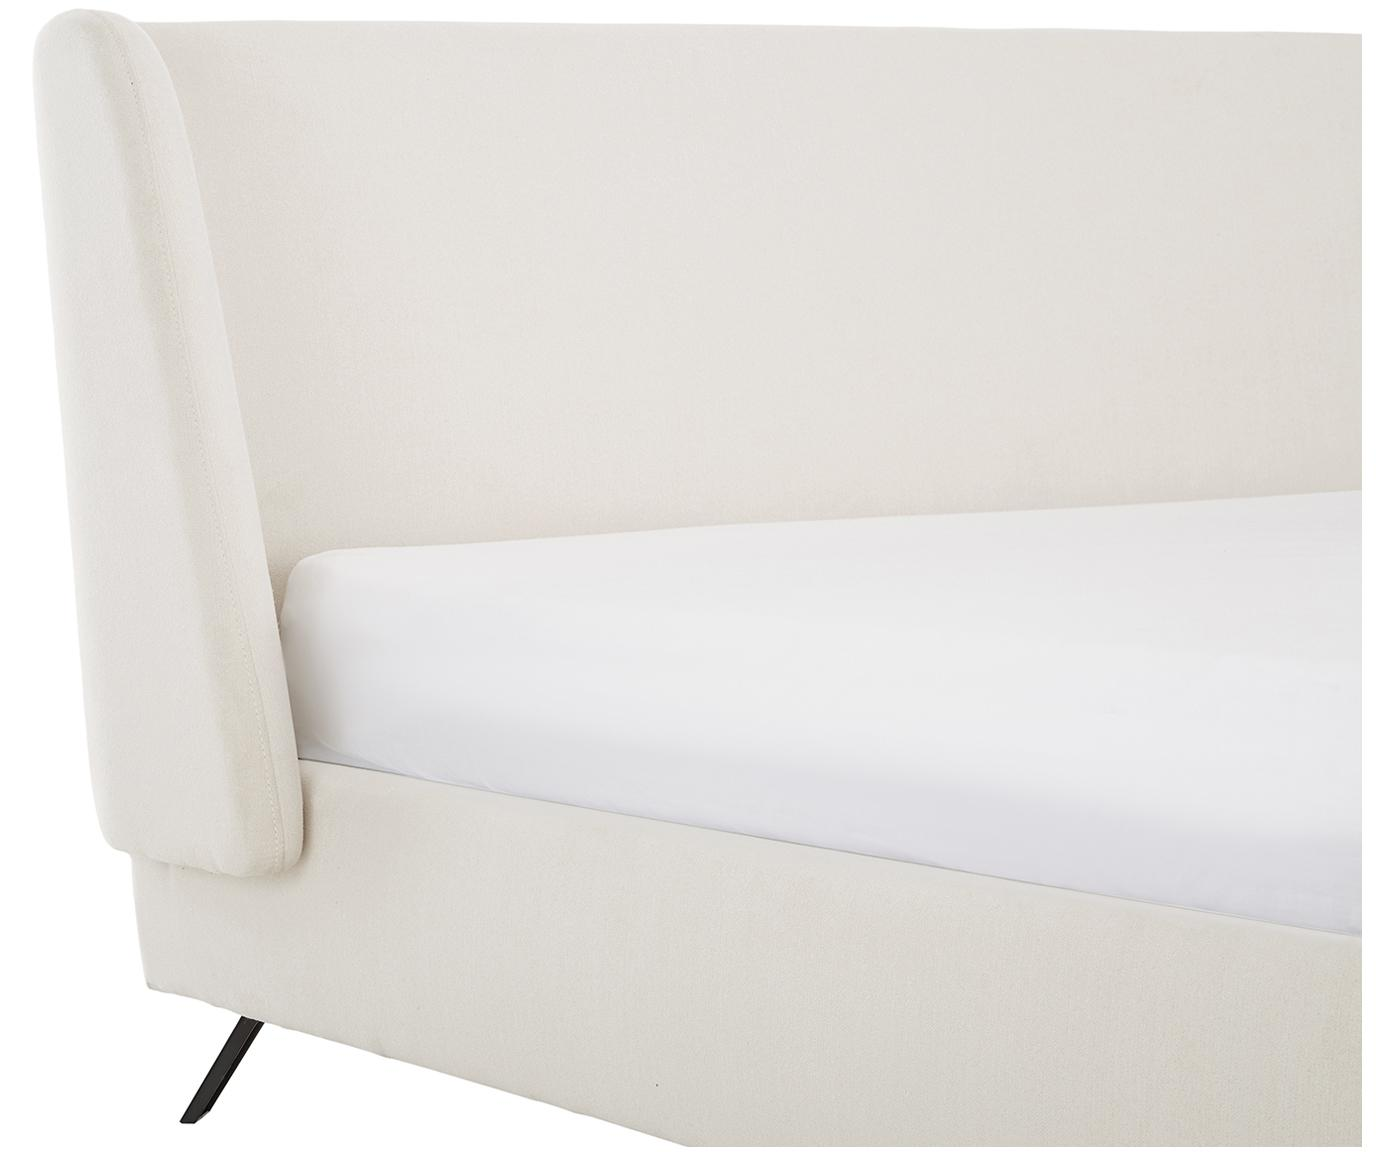 Polsterbett Madonna, Korpus: Massives Kiefernholz, Bezug: Polyester (Strukturstoff), Bezug: BeigeFüsse: Schwarz, matt, 180 x 200 cm